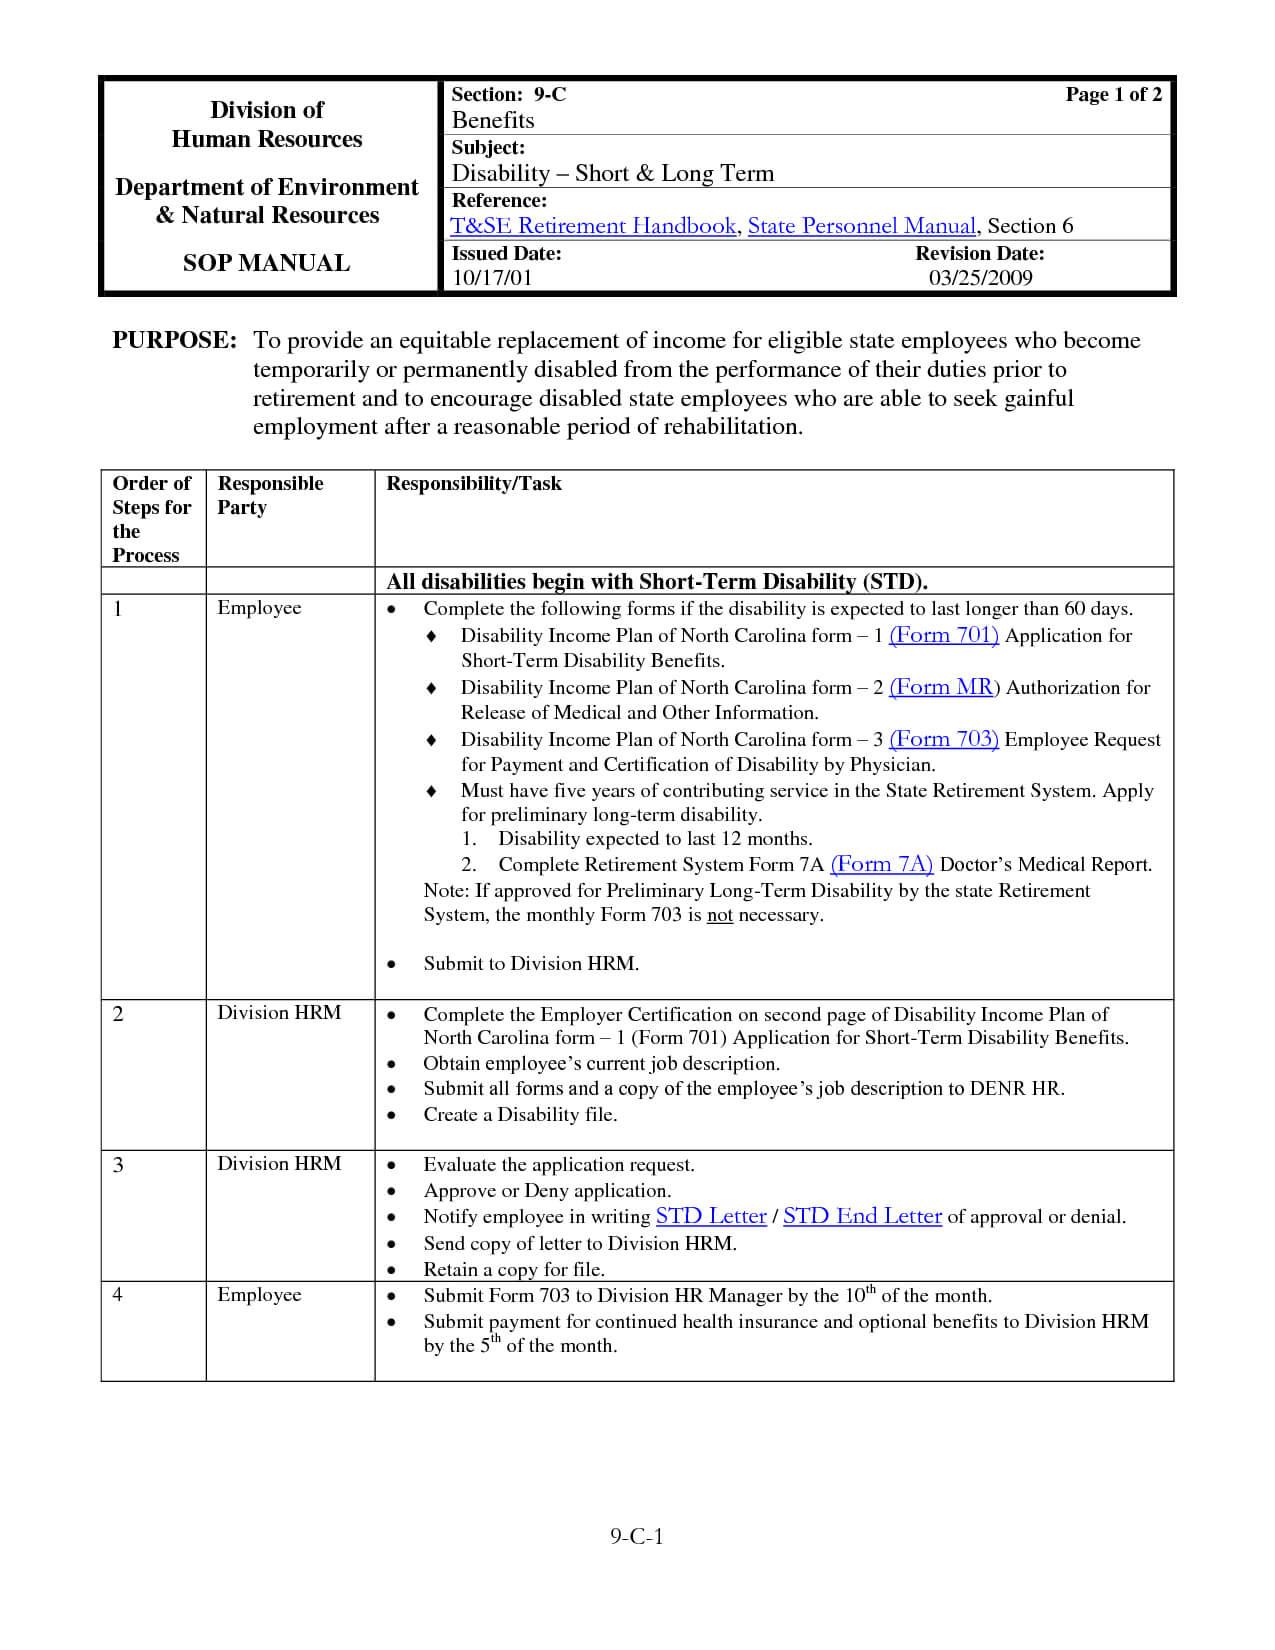 030 Template Ideas Standard Operating Procedure Free Manual Pertaining To Procedure Manual Template Word Free